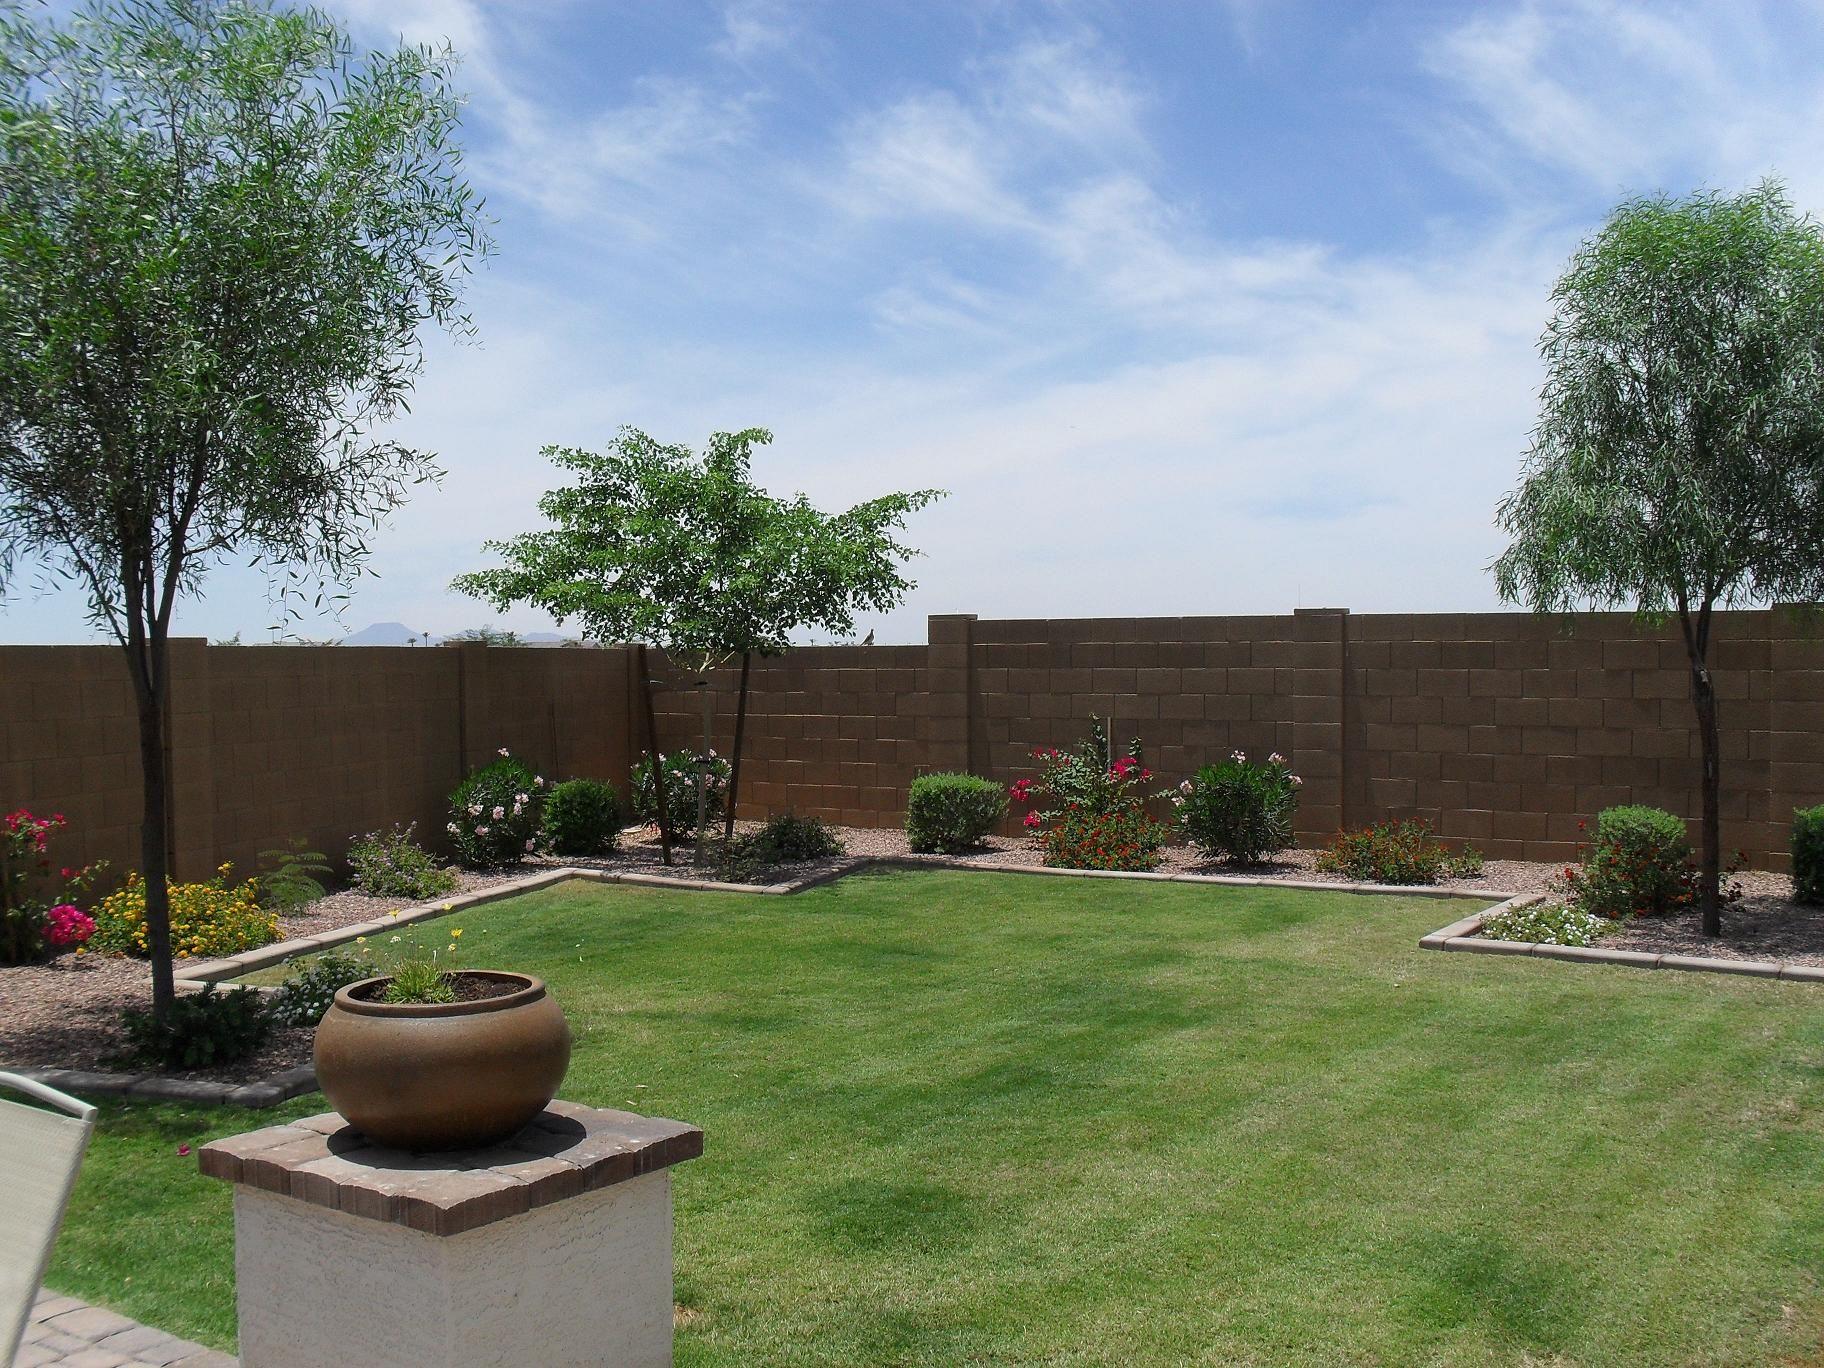 backyard   ... (and EXTREMELY nice) backyard. Pretty sure ... on Nice Backyard Landscaping Ideas id=15787